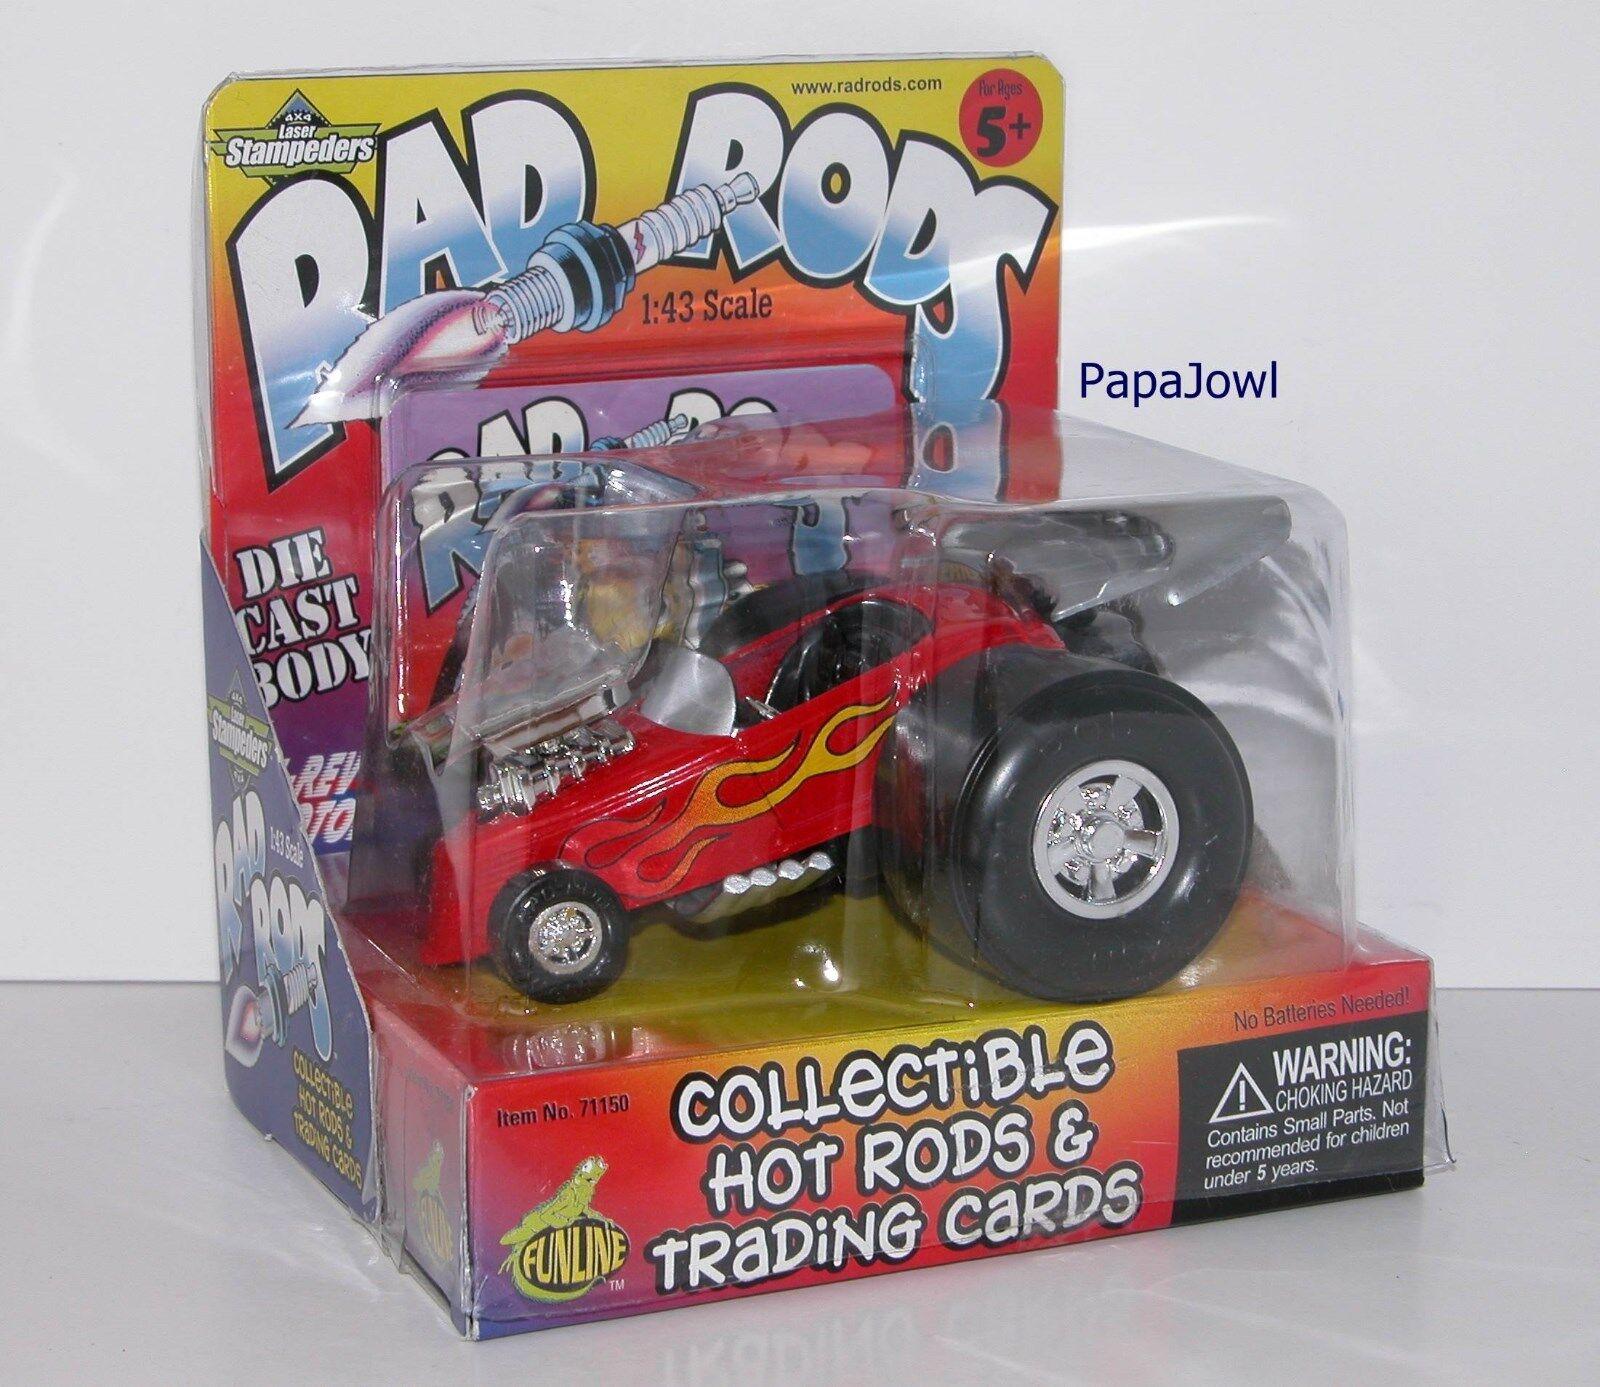 Rat Fink Rad Varillas Stampeders muscular máquinas Ford Roadster Roadster Roadster por Funline escala 1 43 9fadd9